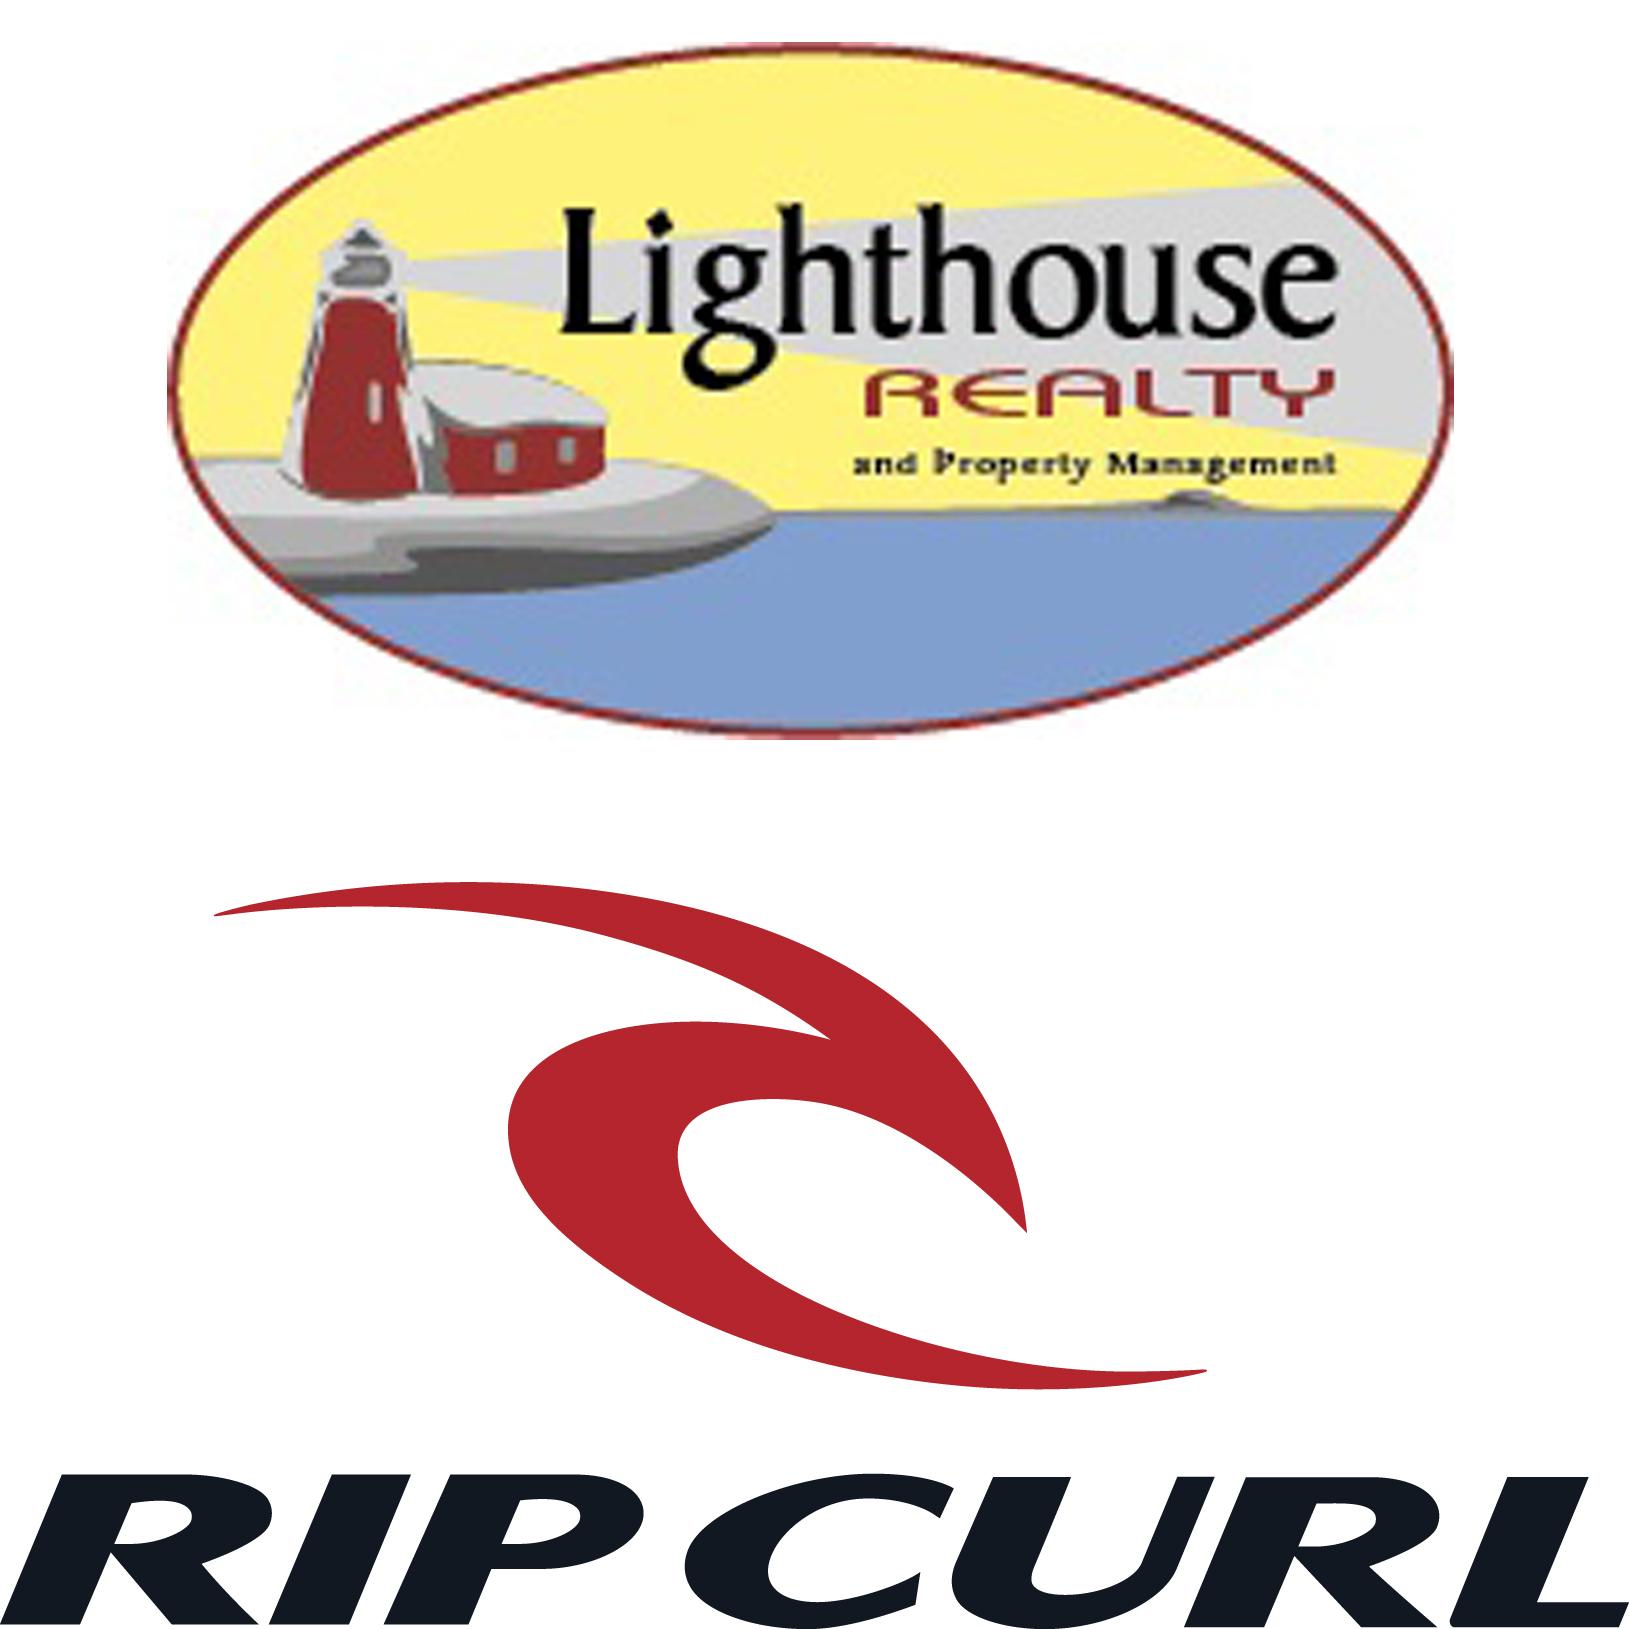 Lighthouse_ripcurl.jpg